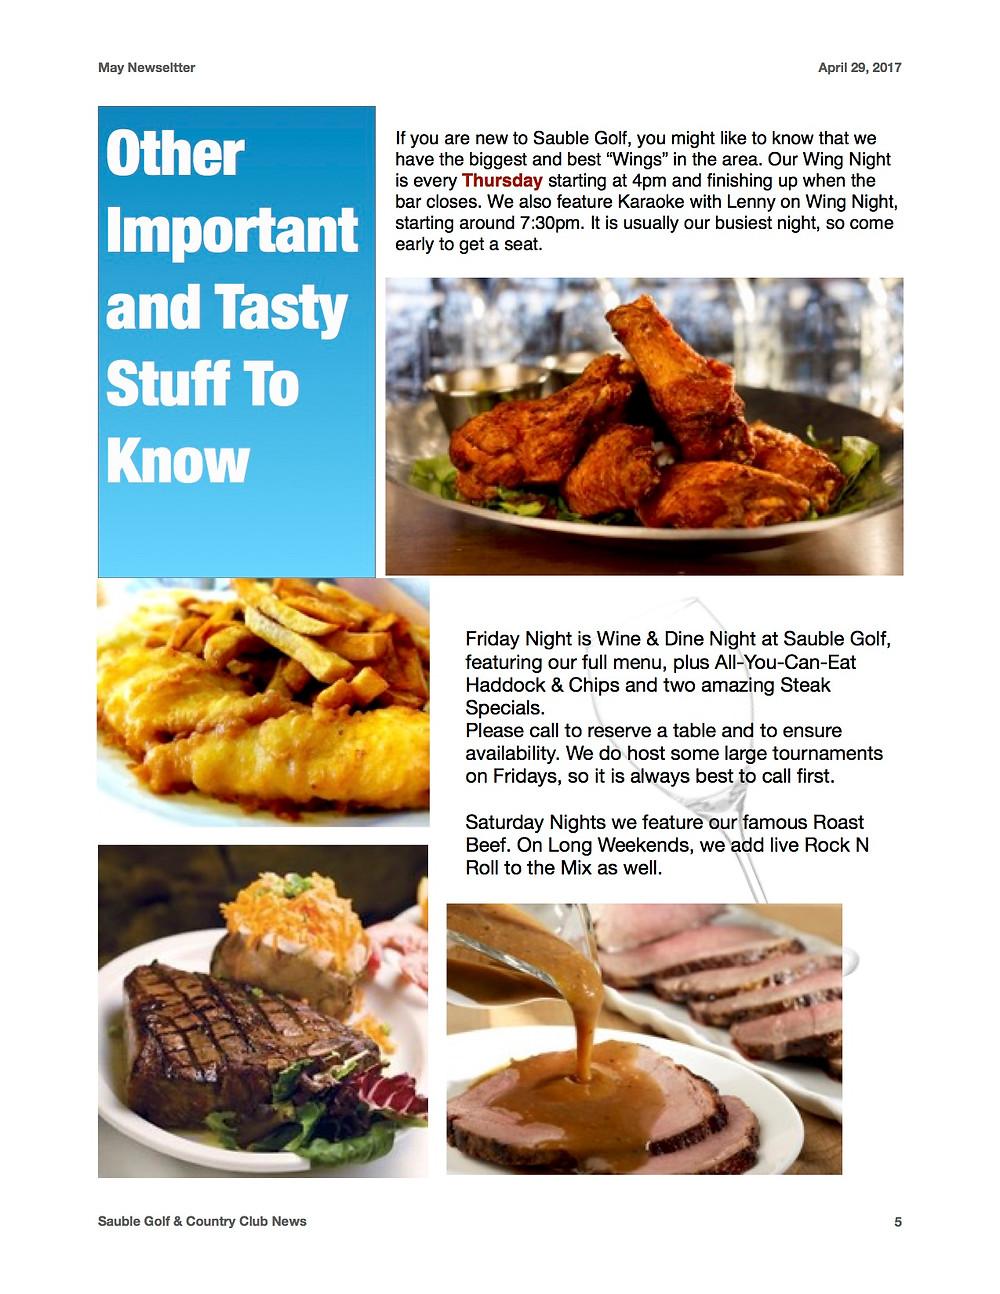 Specialties of the House: Wings, Fish & Chips, Steak, Roast Beef